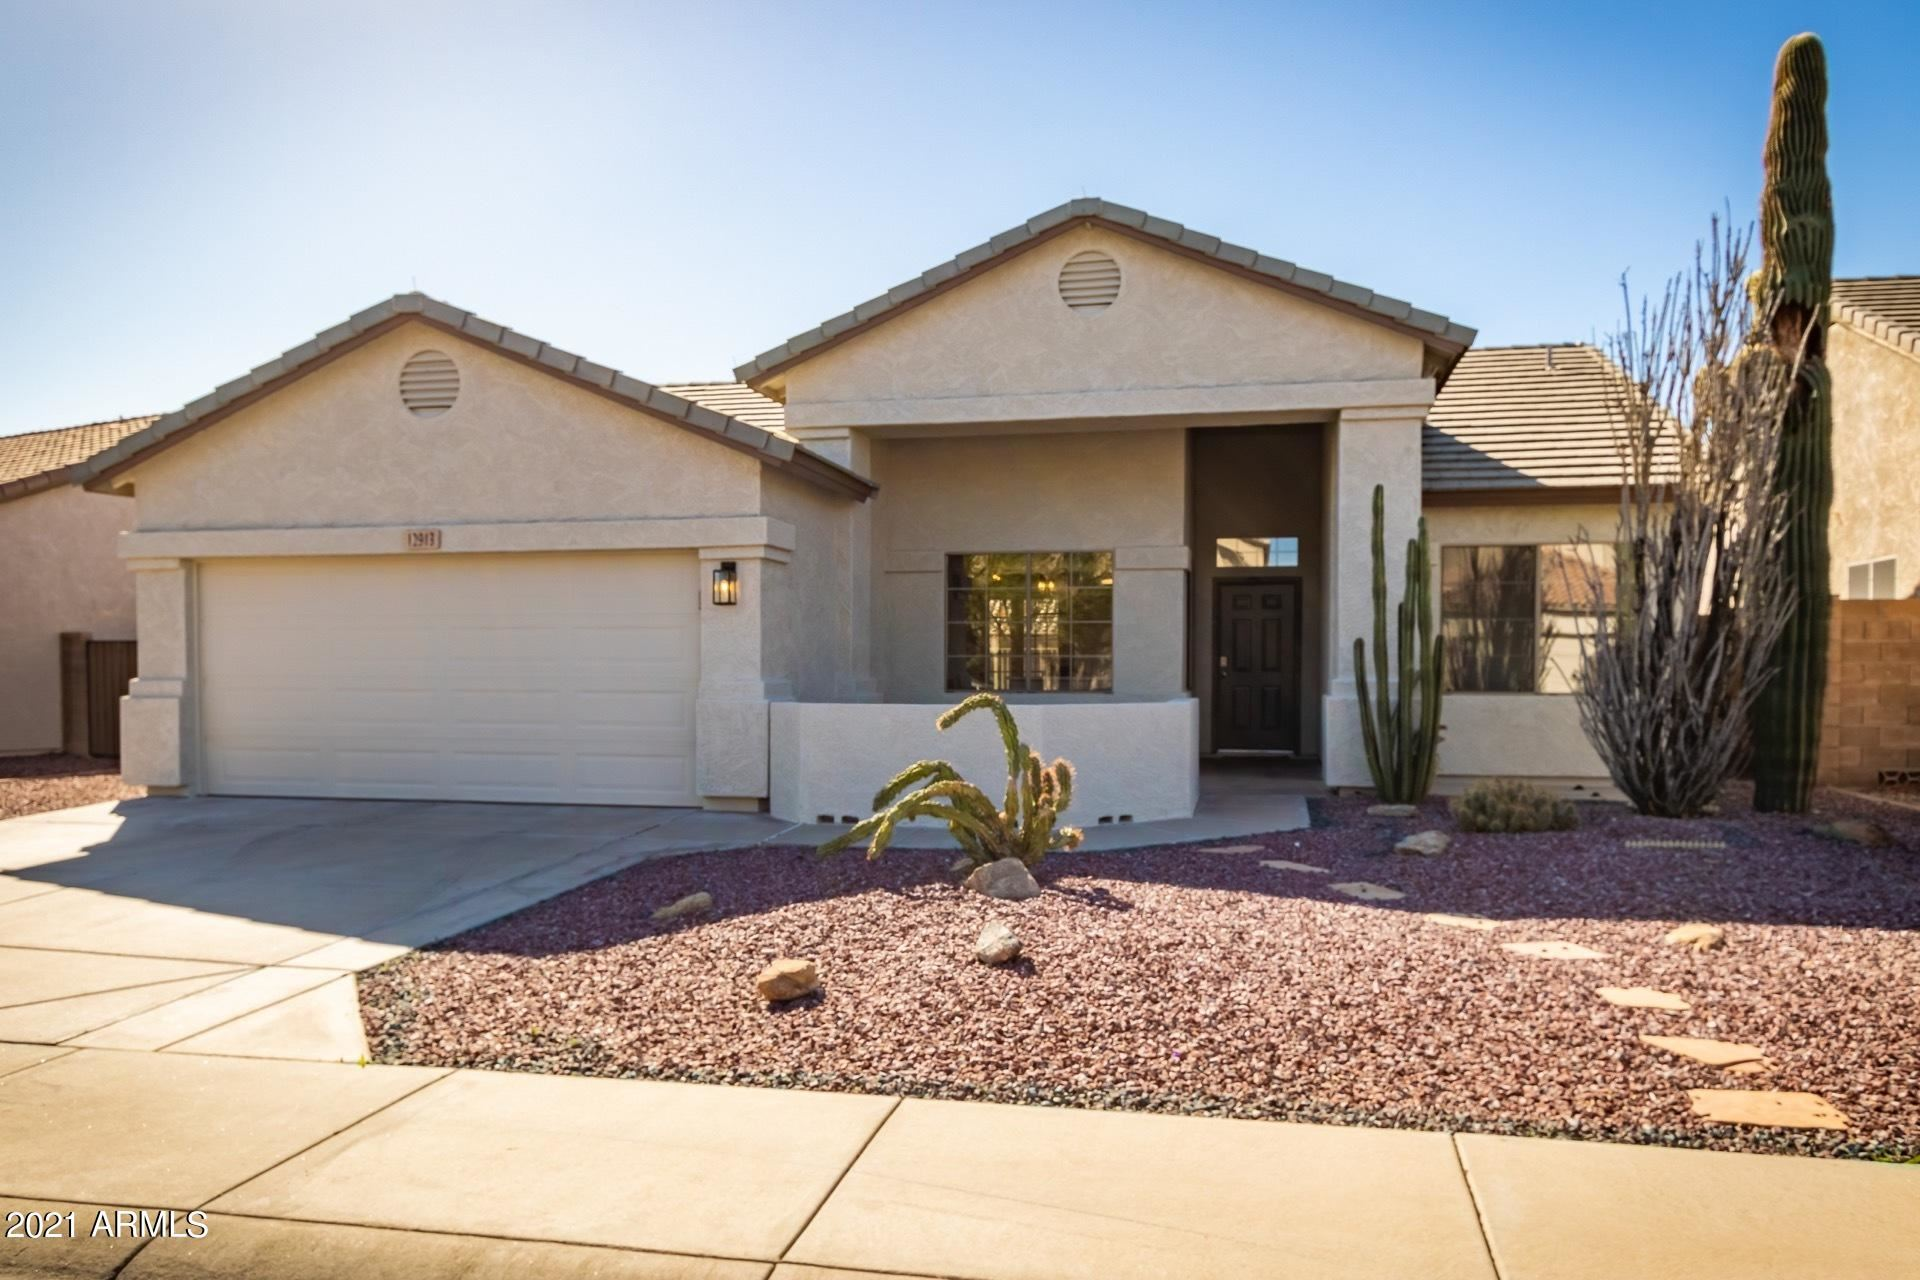 Photo of 12913 W ASH Street, El Mirage, AZ 85335 (MLS # 6196225)